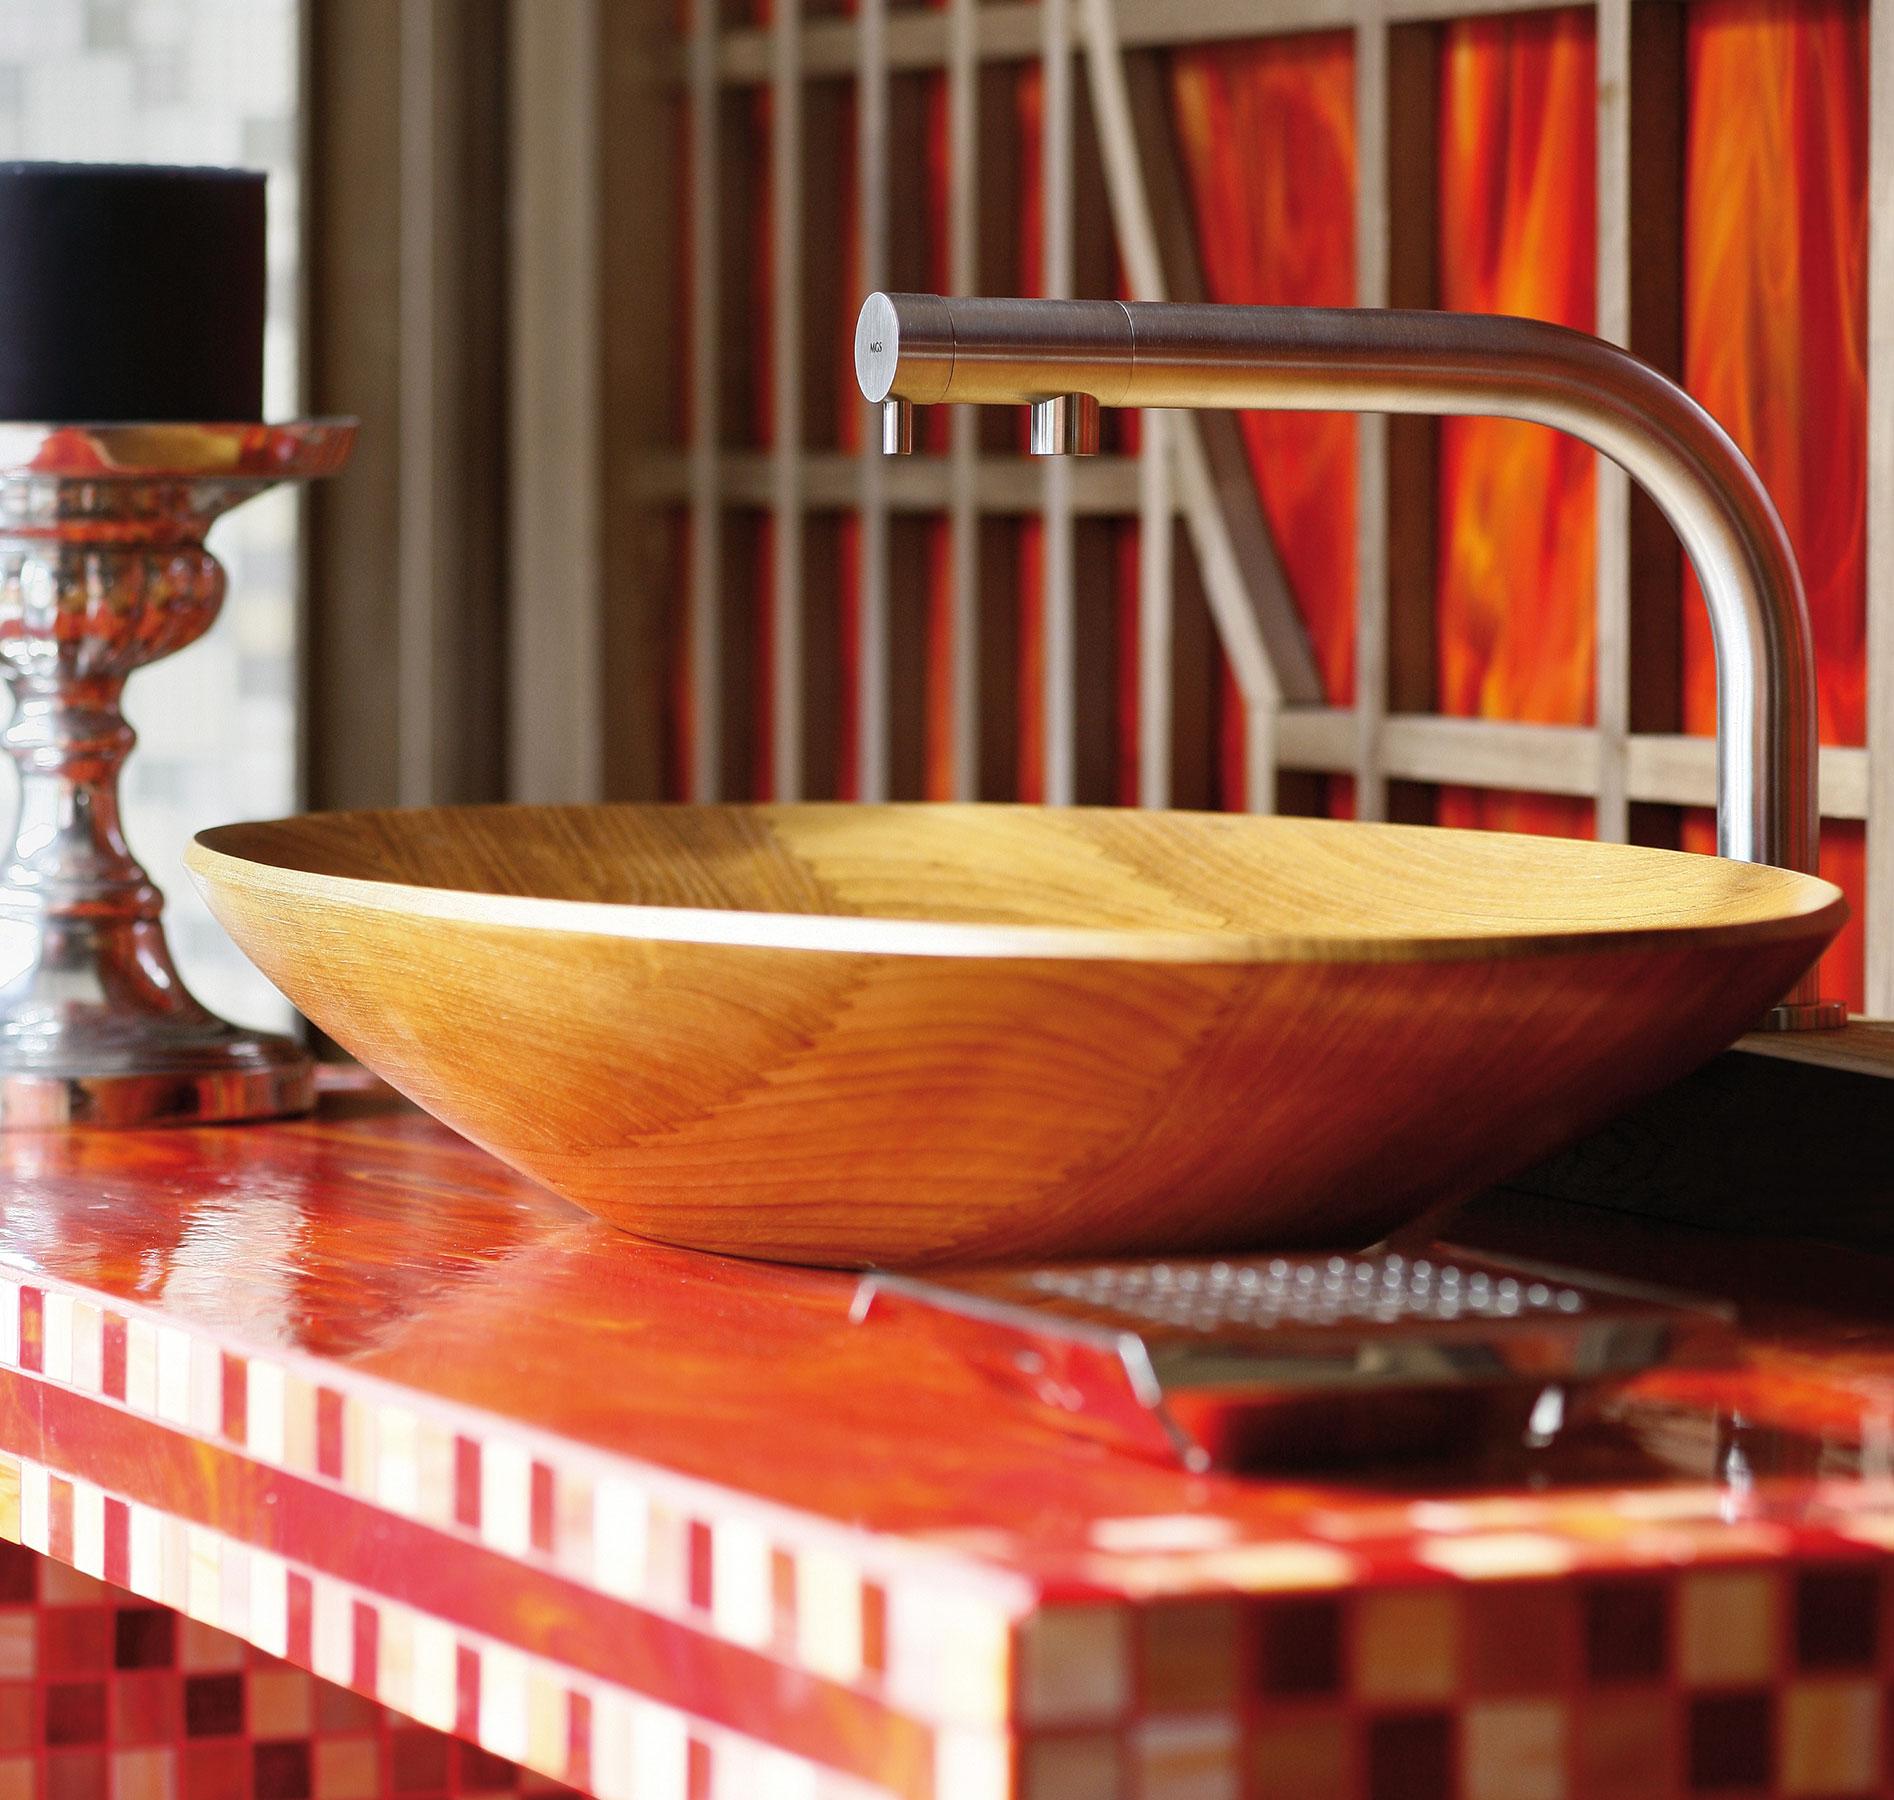 Transitional Minimal Beauty Deck Mount Faucet